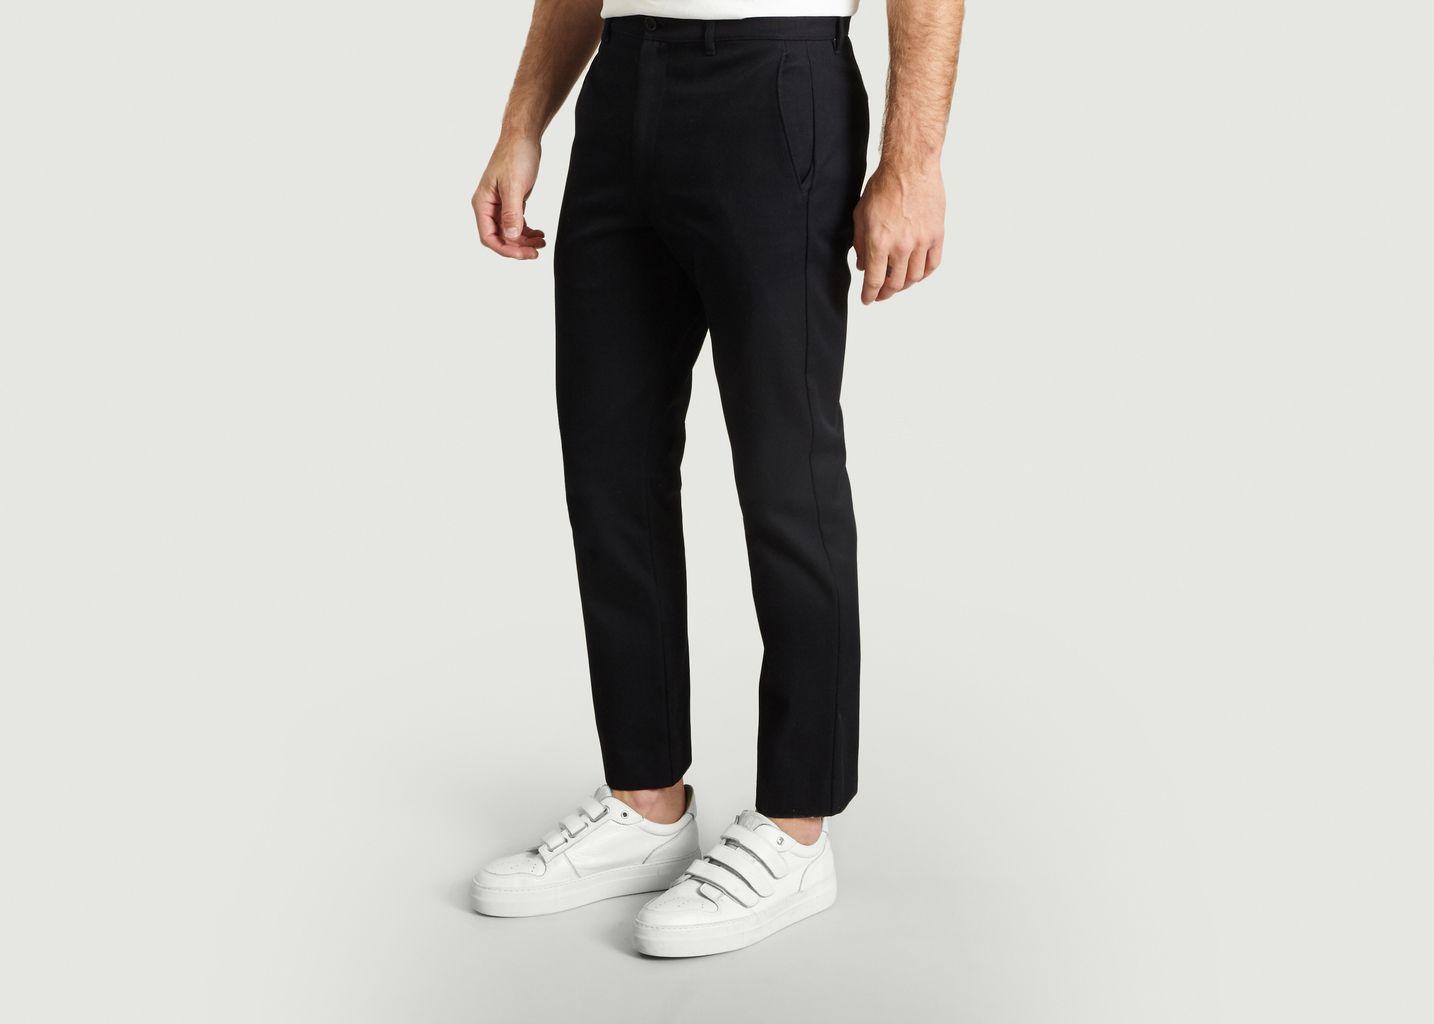 Pantalon En Coton Marco - A.P.C.